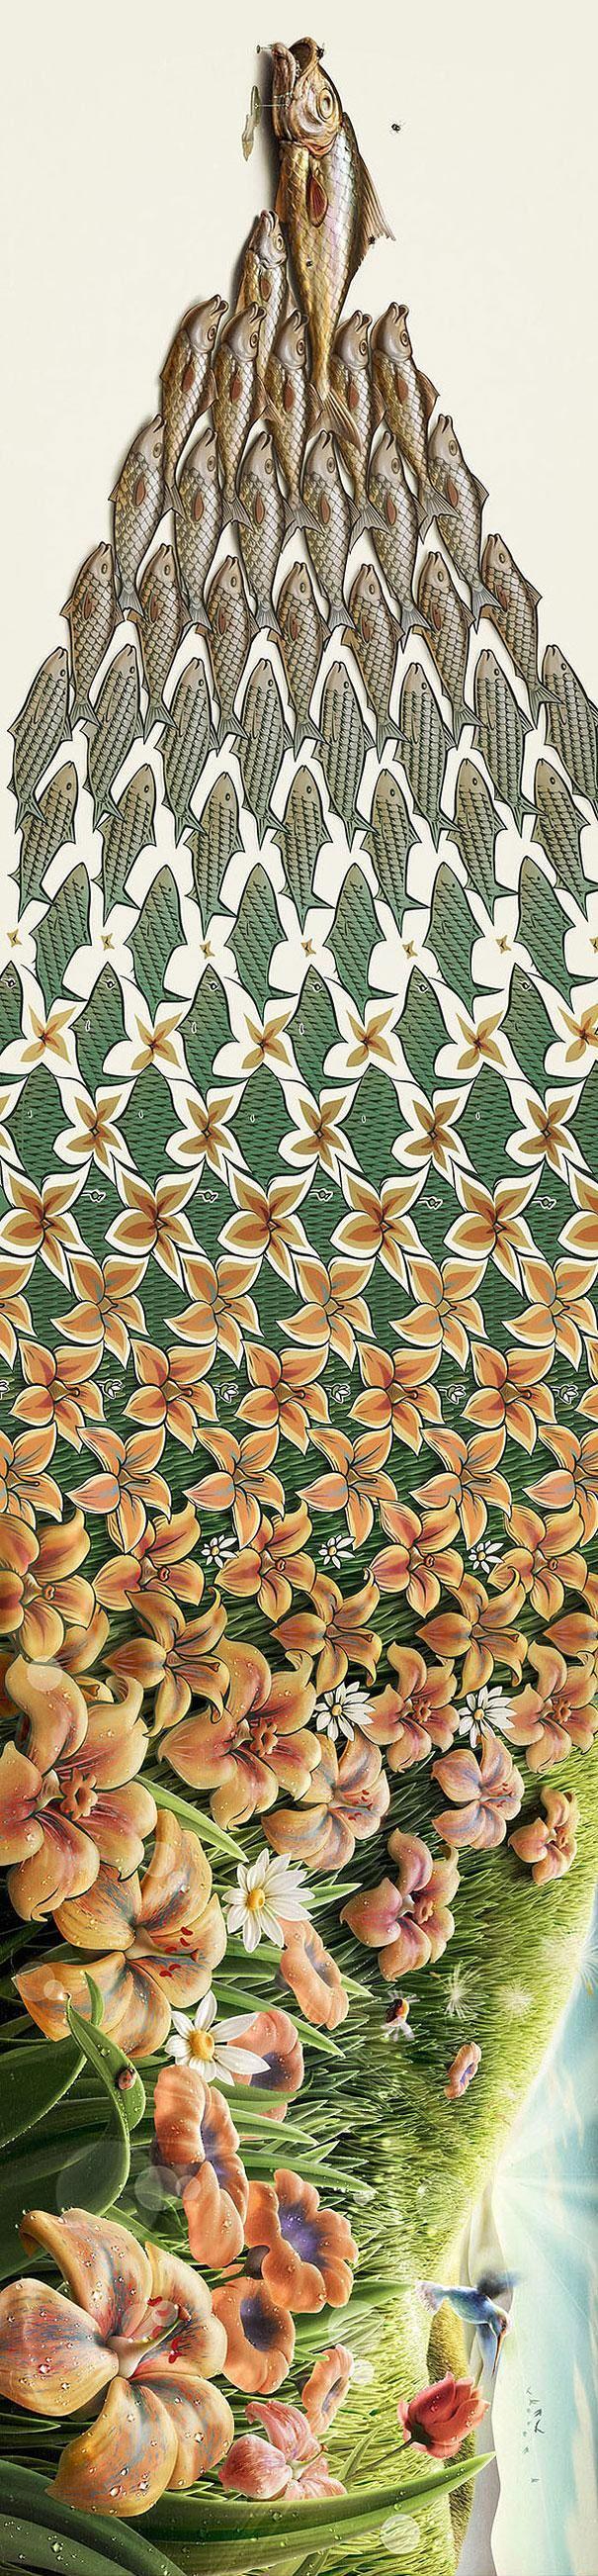 adplus-illustrations-oscar-ramos-1.jpg